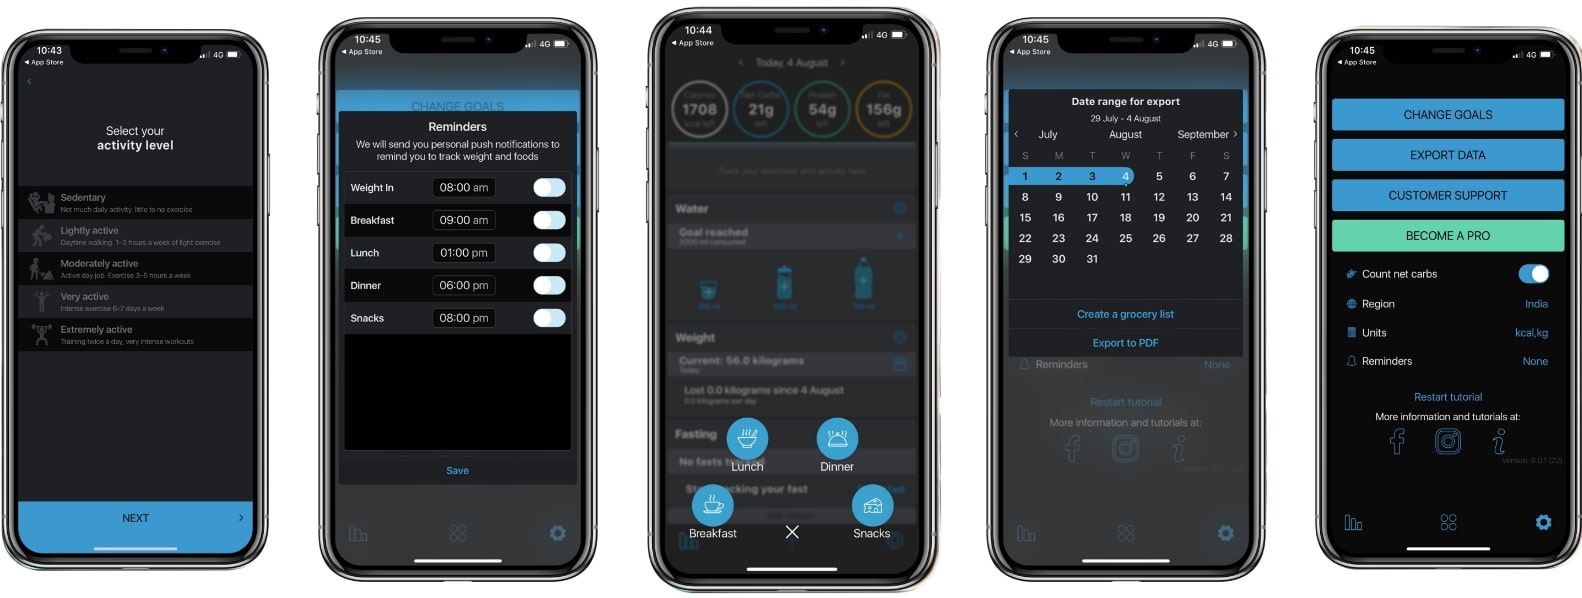 screenshot of the keto diet app